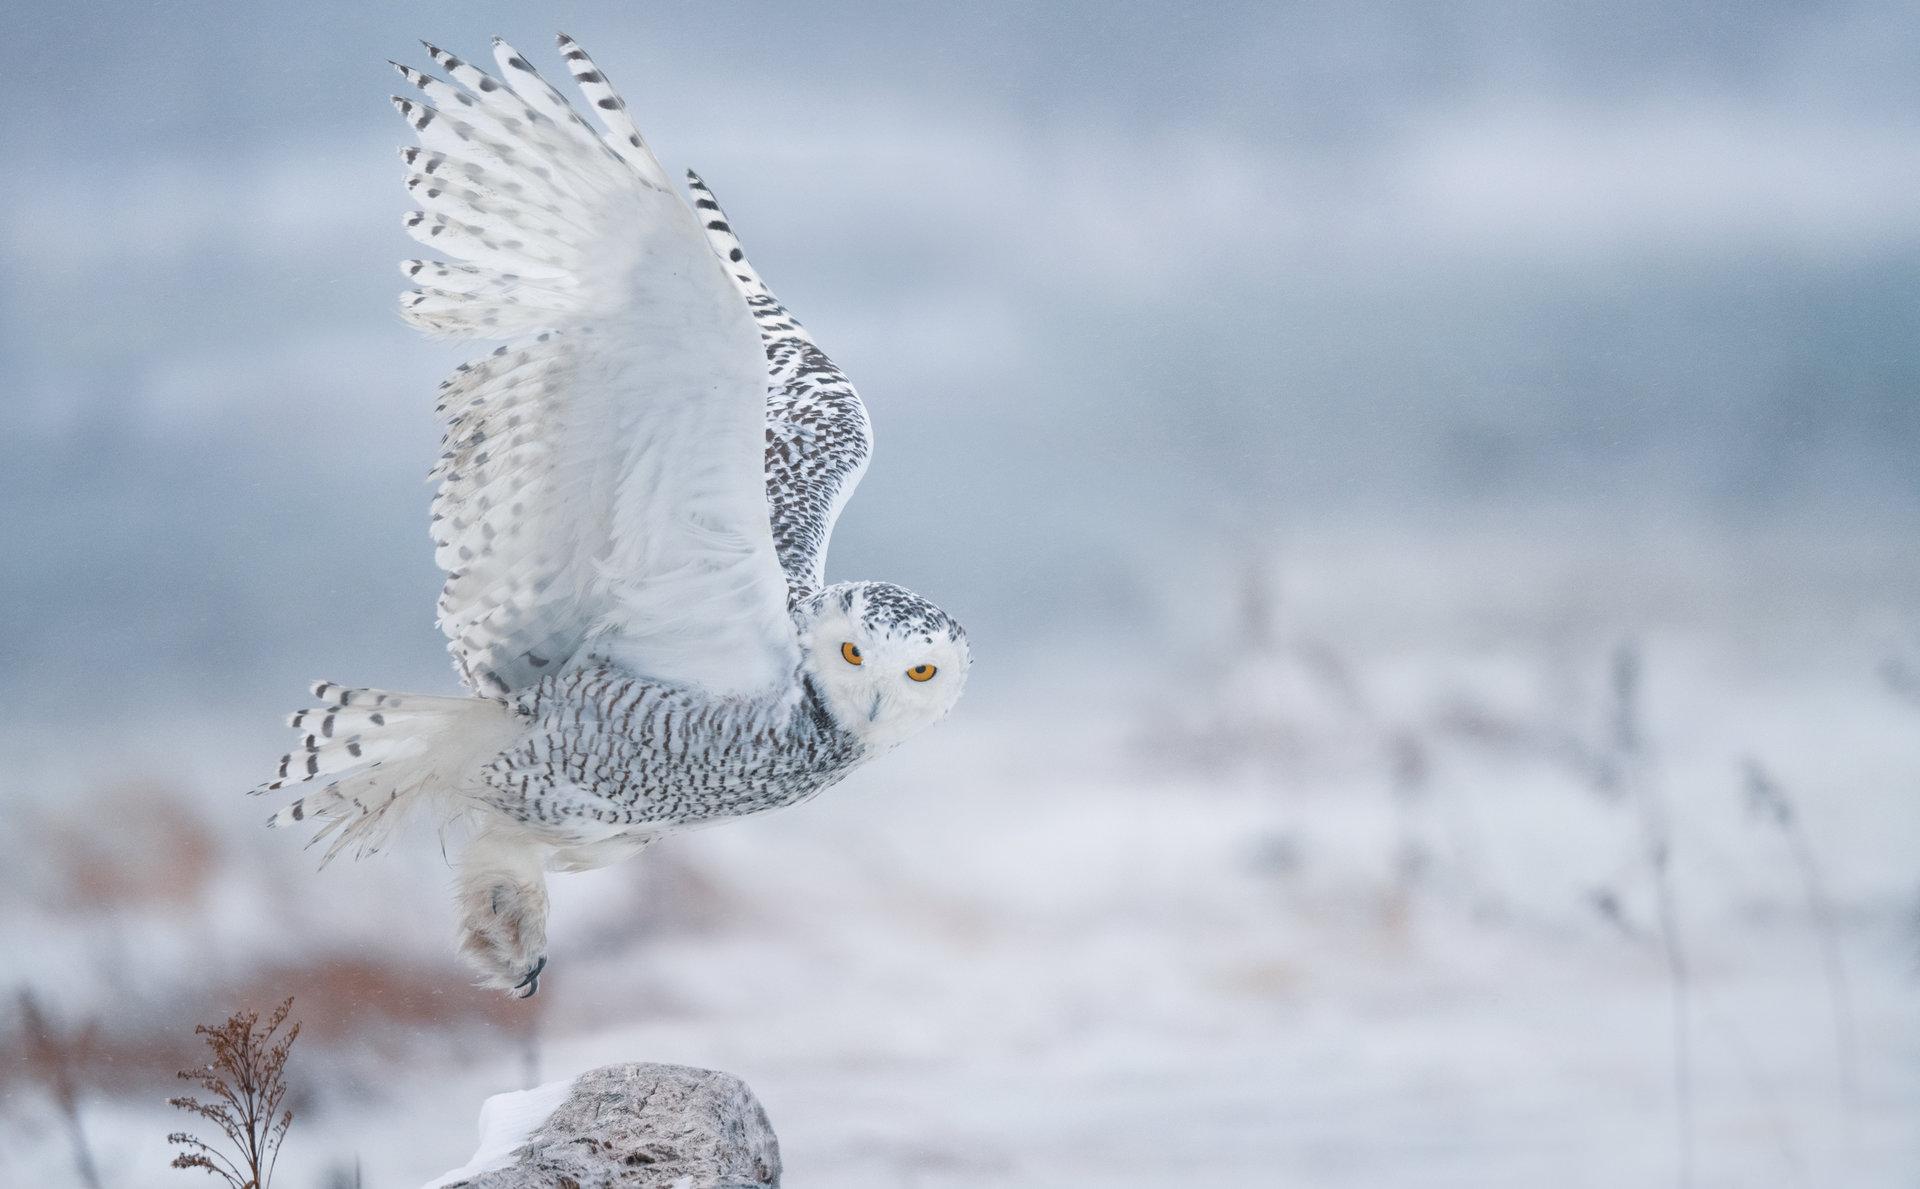 Photo in Wild life | Author Zhoro  - HITTHEROAD | PHOTO FORUM